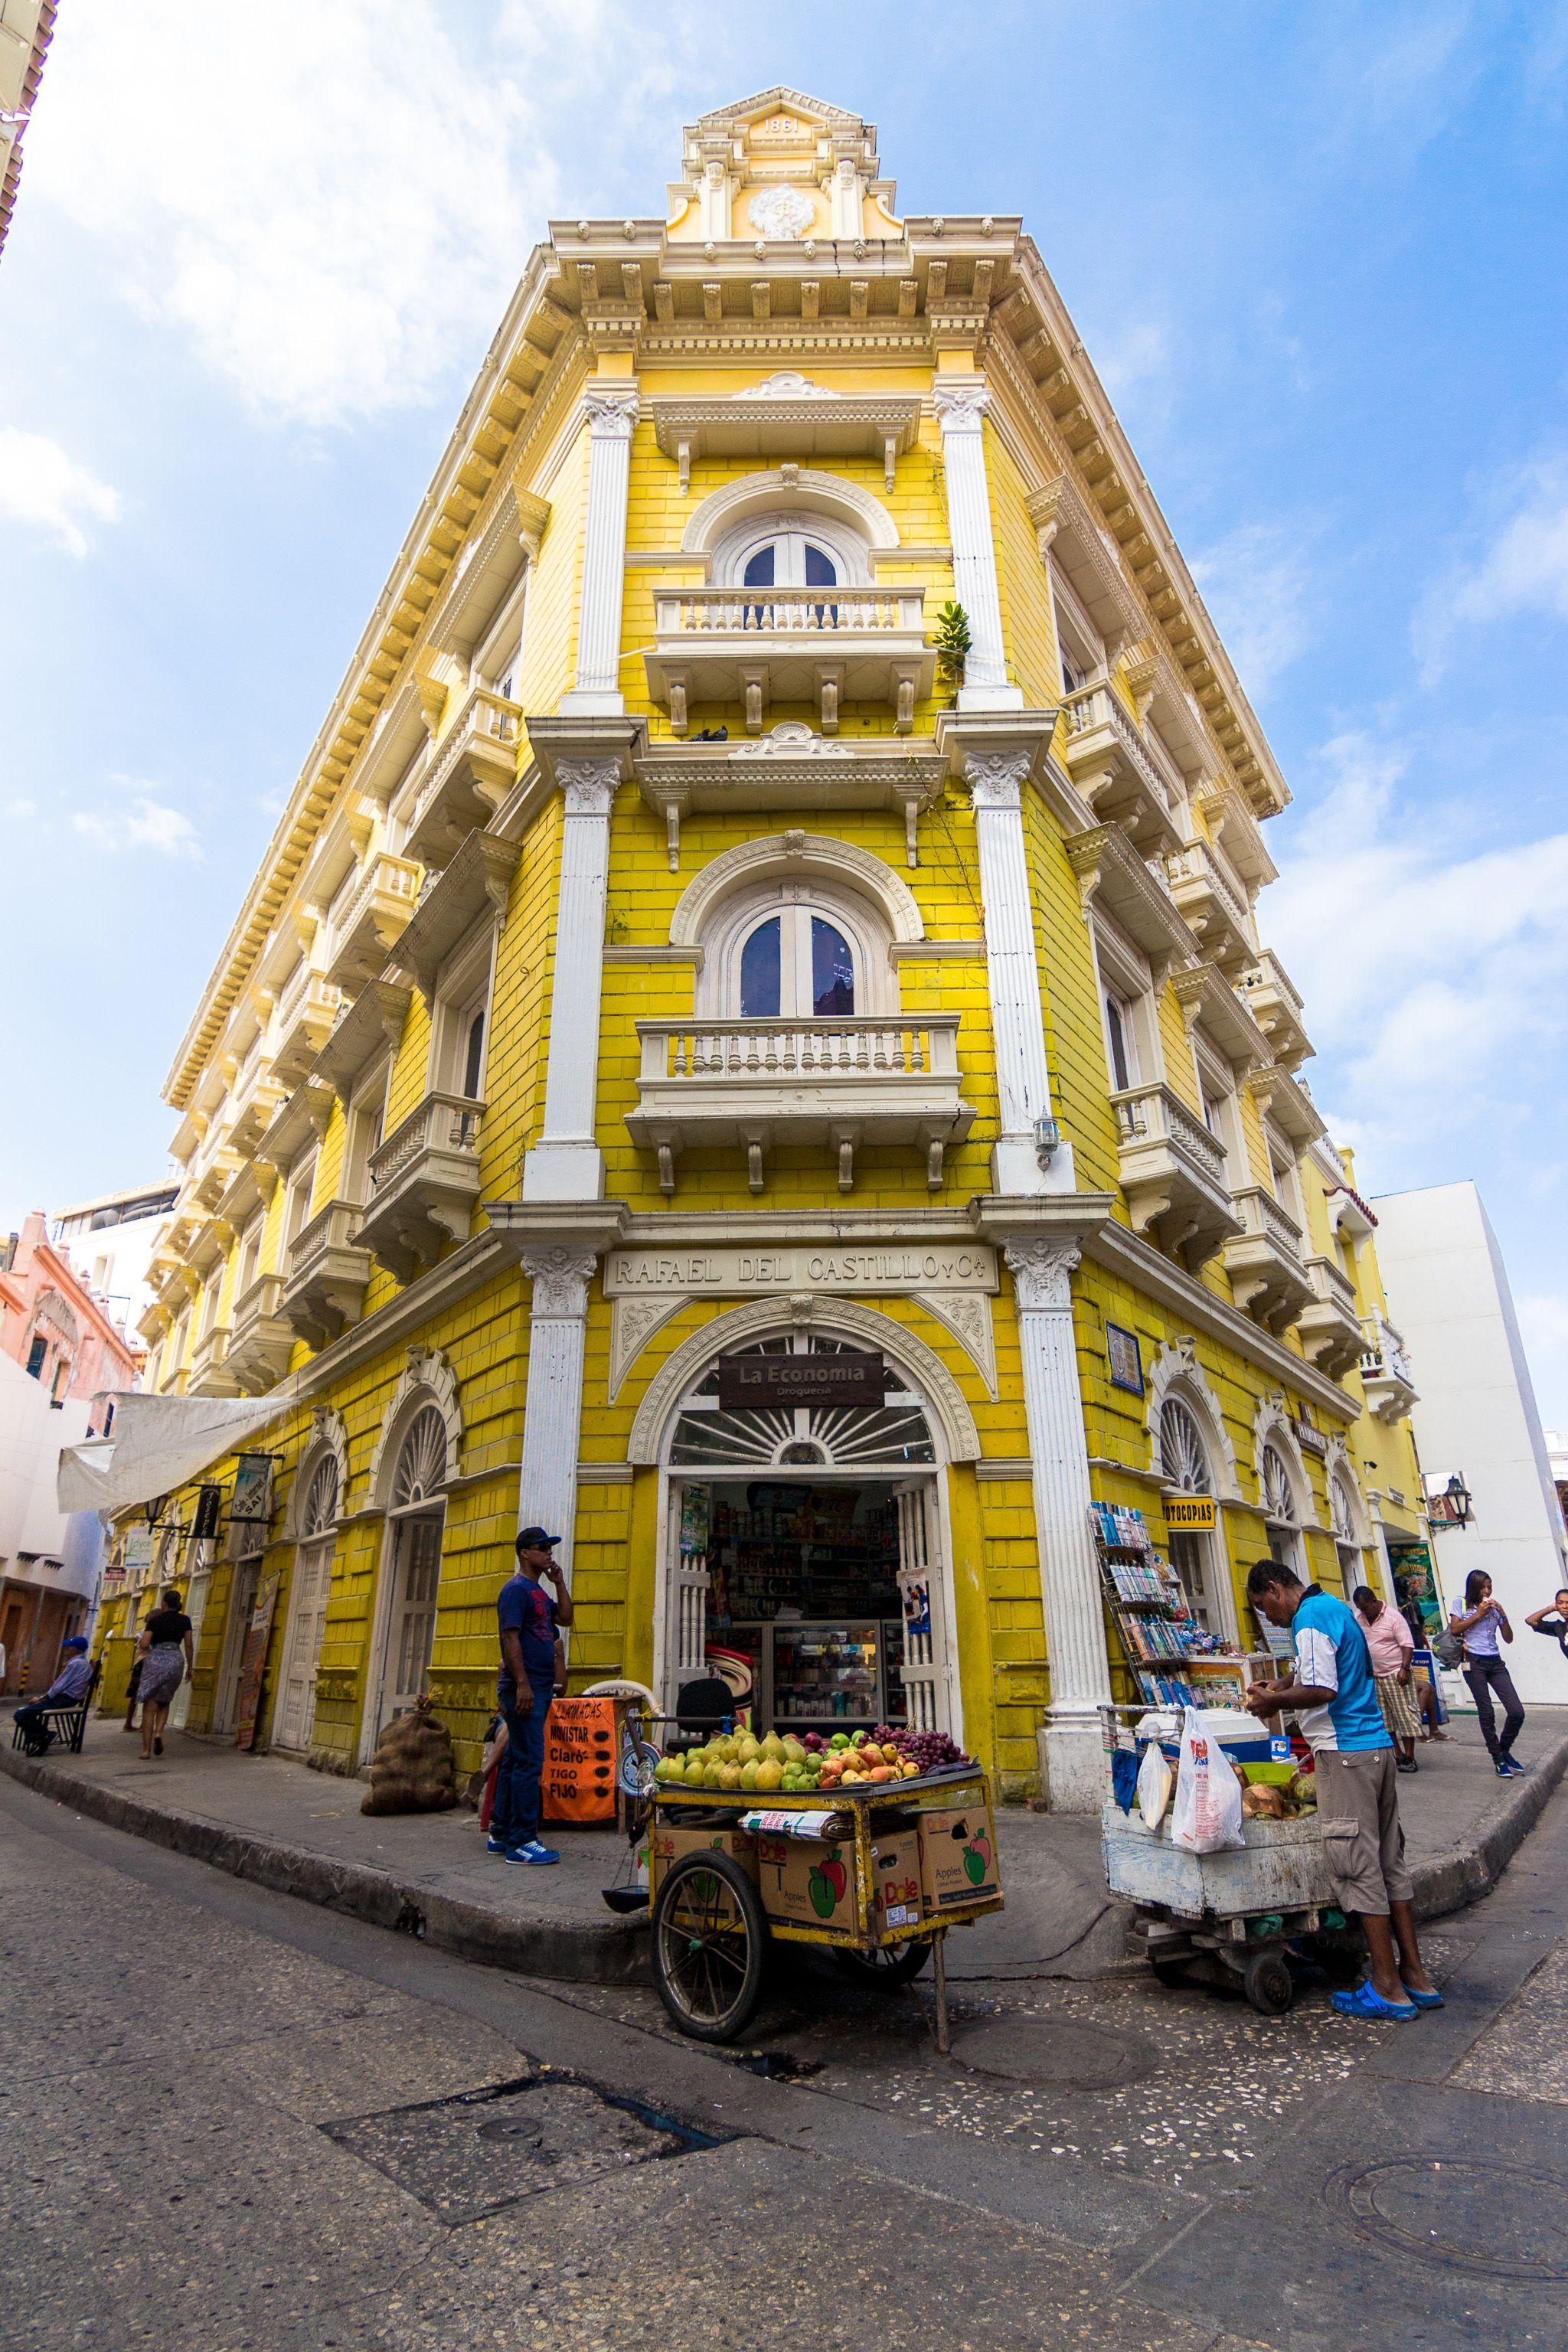 Colombia and its impressive architecture.